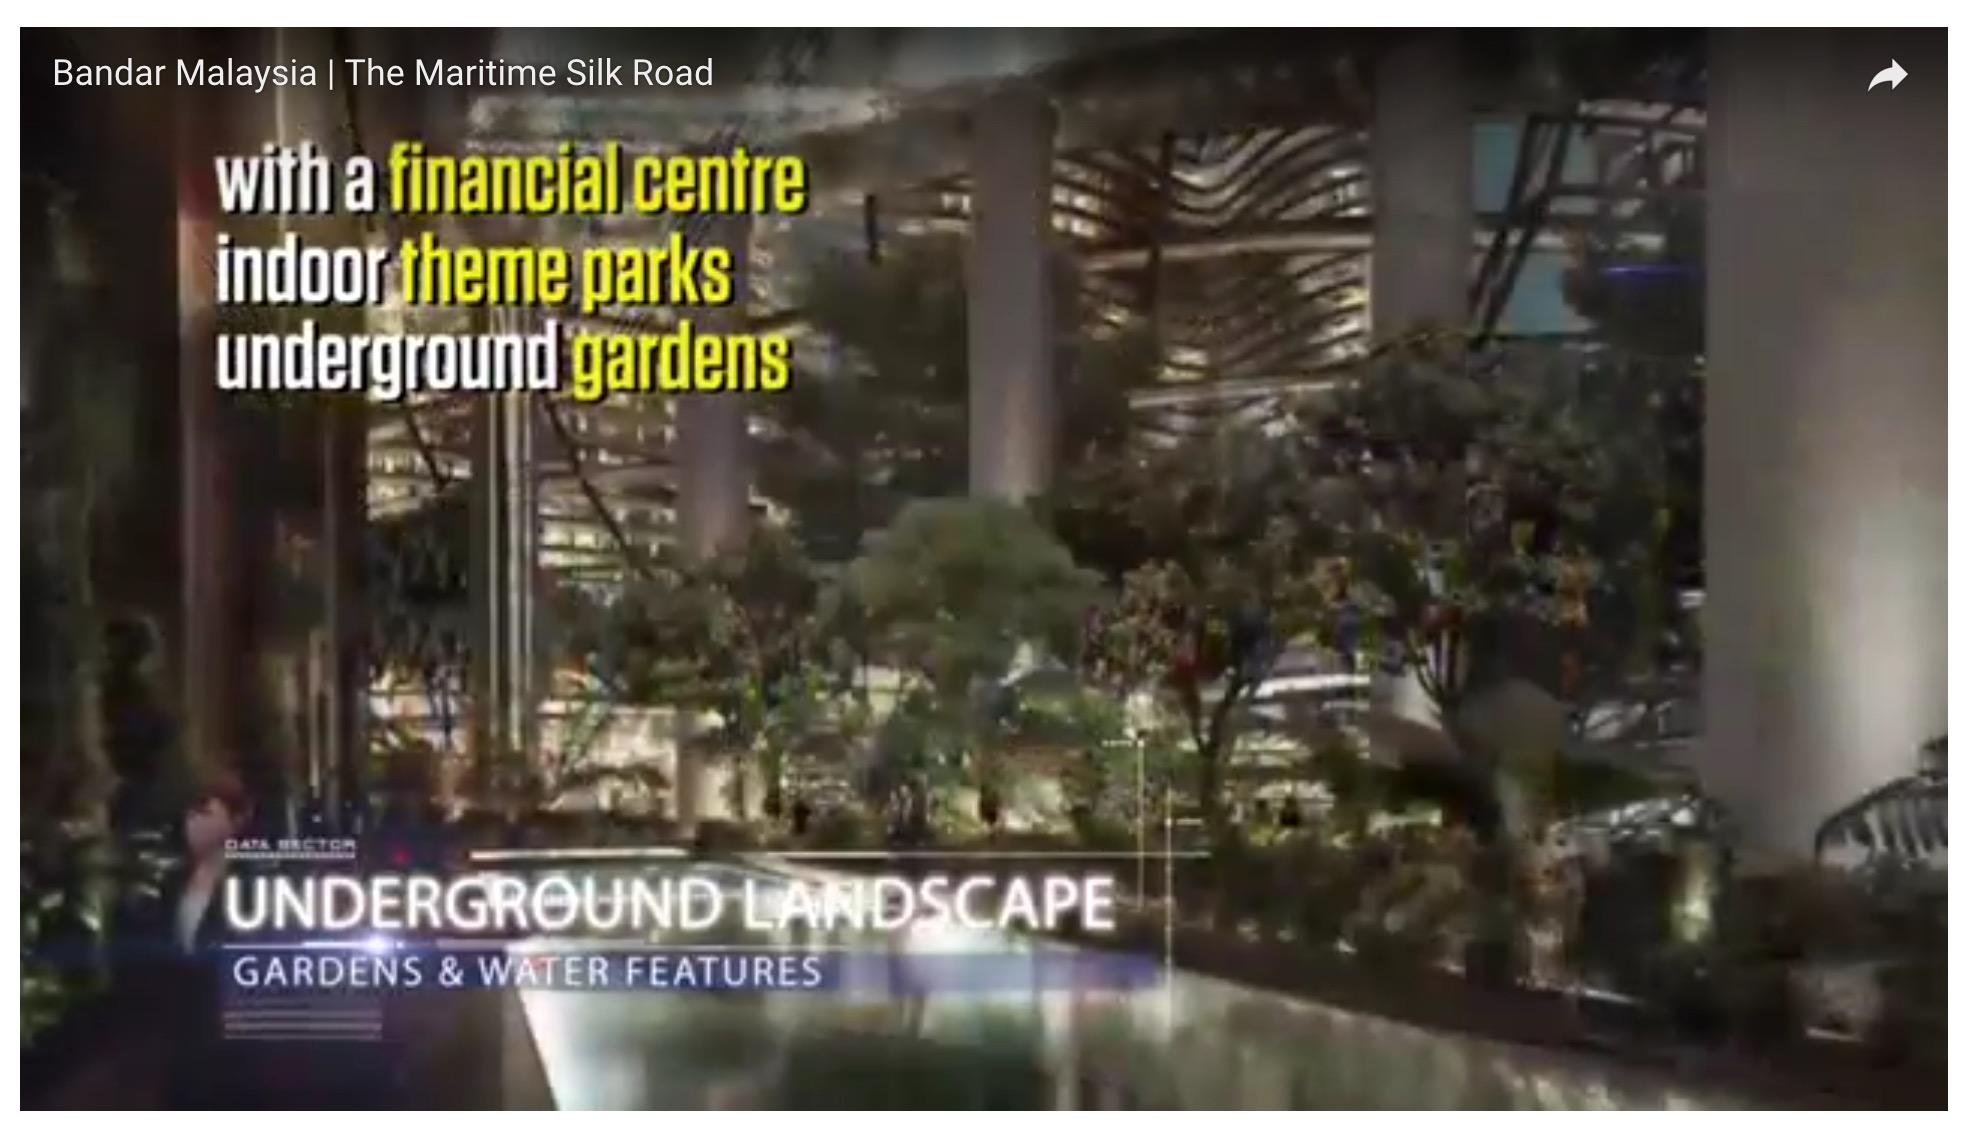 Midfields 2 condo Bandar malaysia KL TERMINAL HIGH SPEED RIAL malaysia china Midfields 2